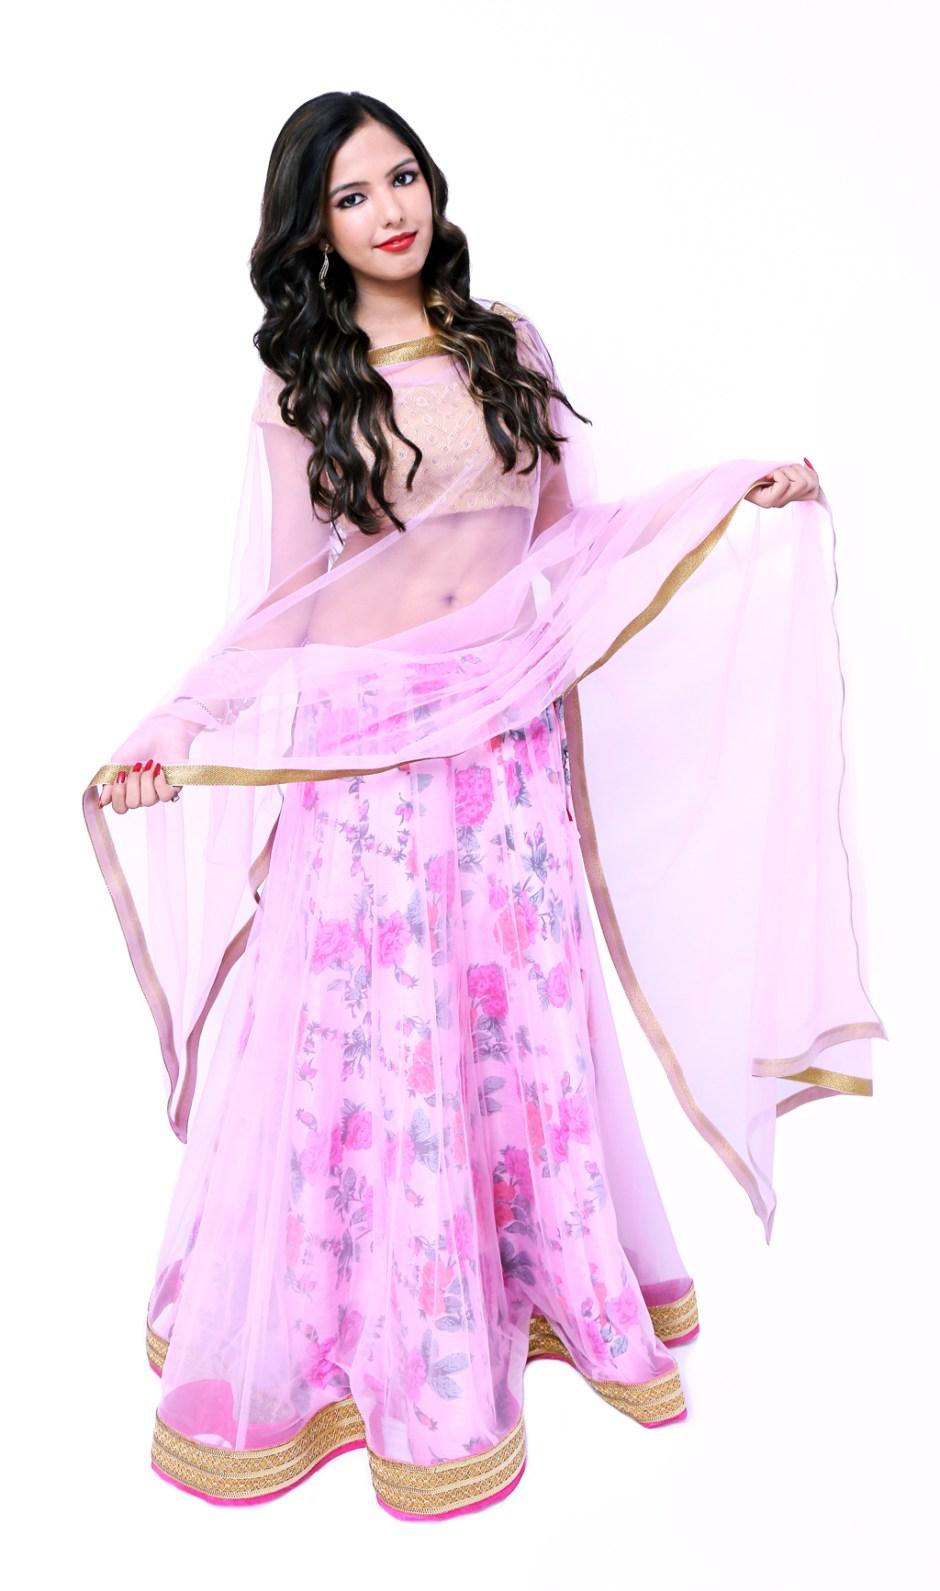 craftsvilla-review-ethnic-wear-prices-buy-online